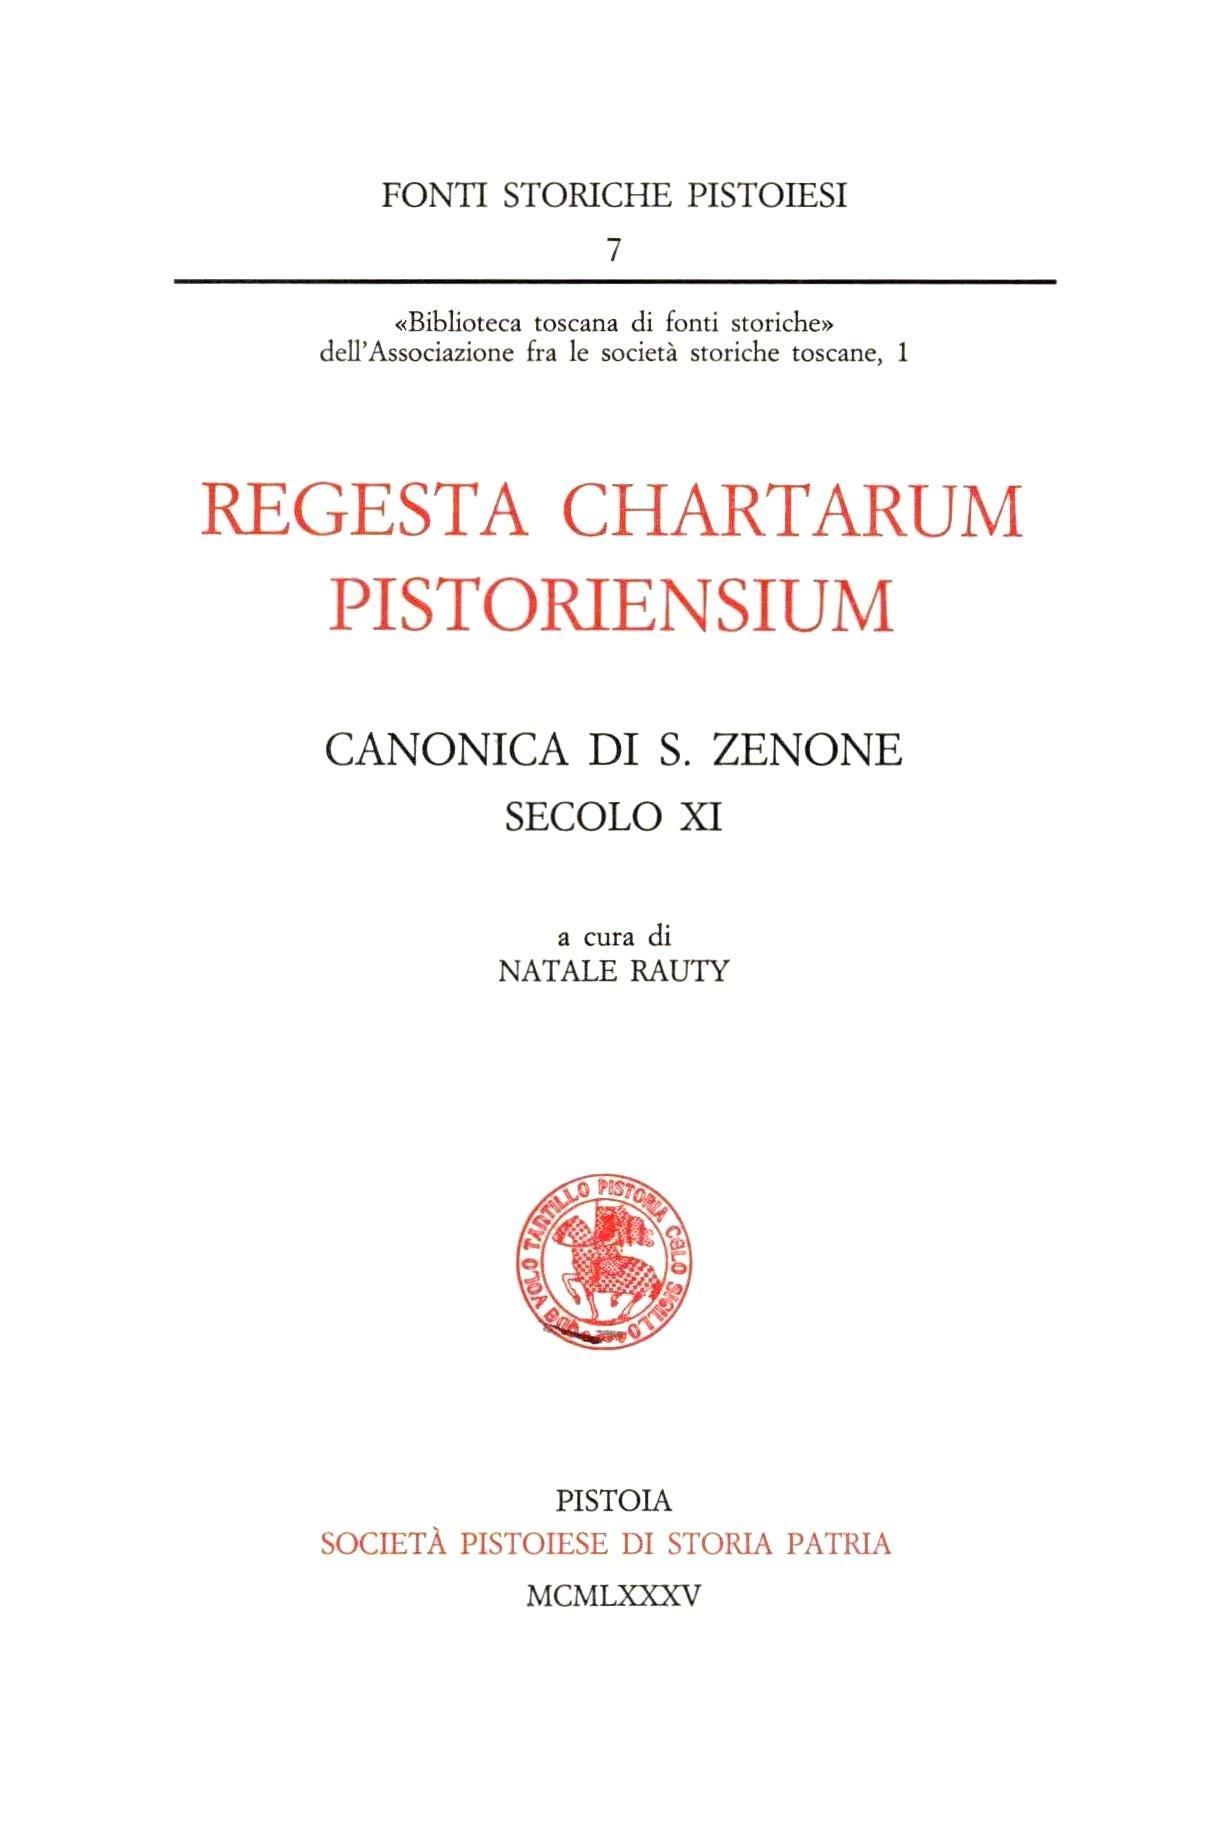 !Canonica S. Zenone XI 00001.jpg